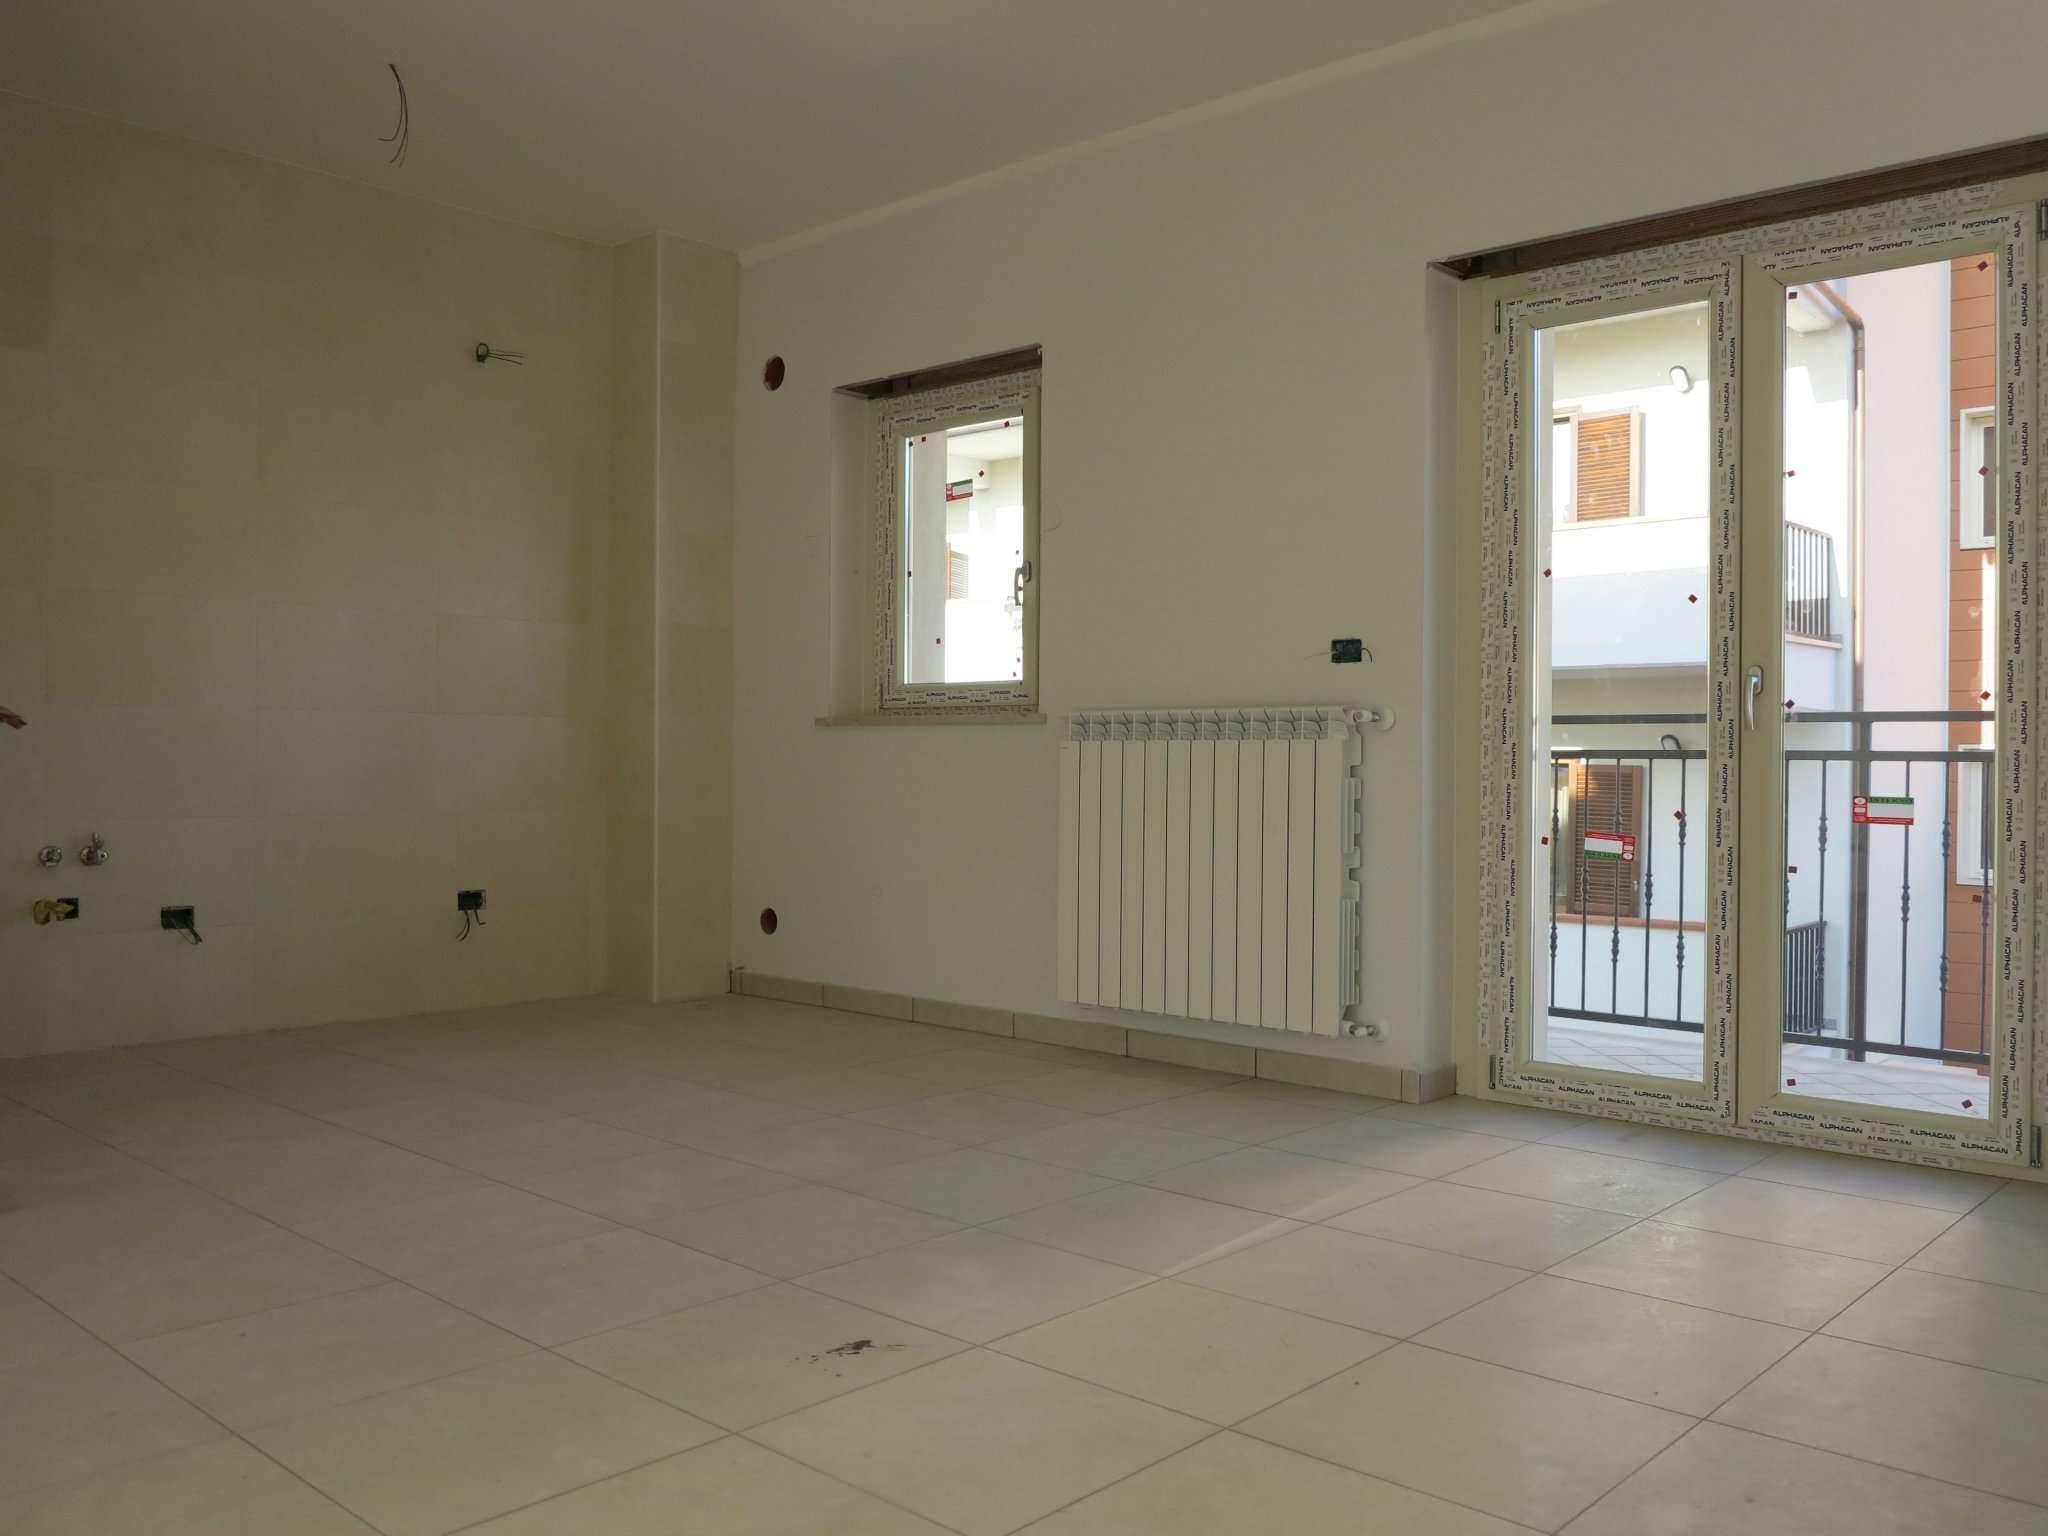 Appartamento, Milonia, Pettino, Vendita - L'aquila (L'Aquila)